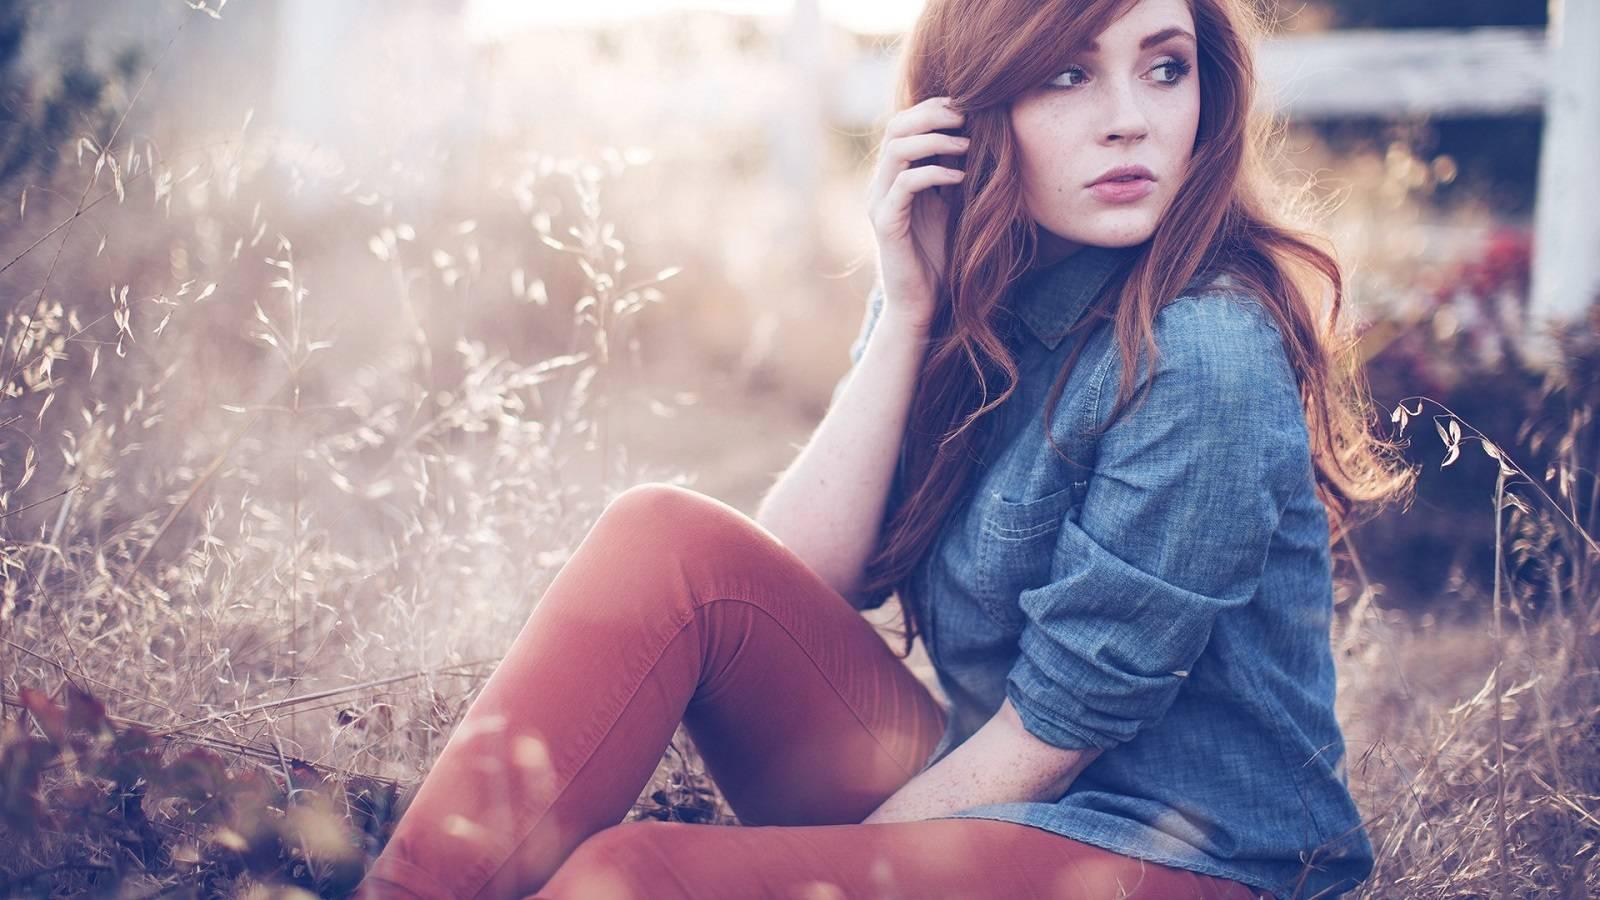 Photo of girl webmodel